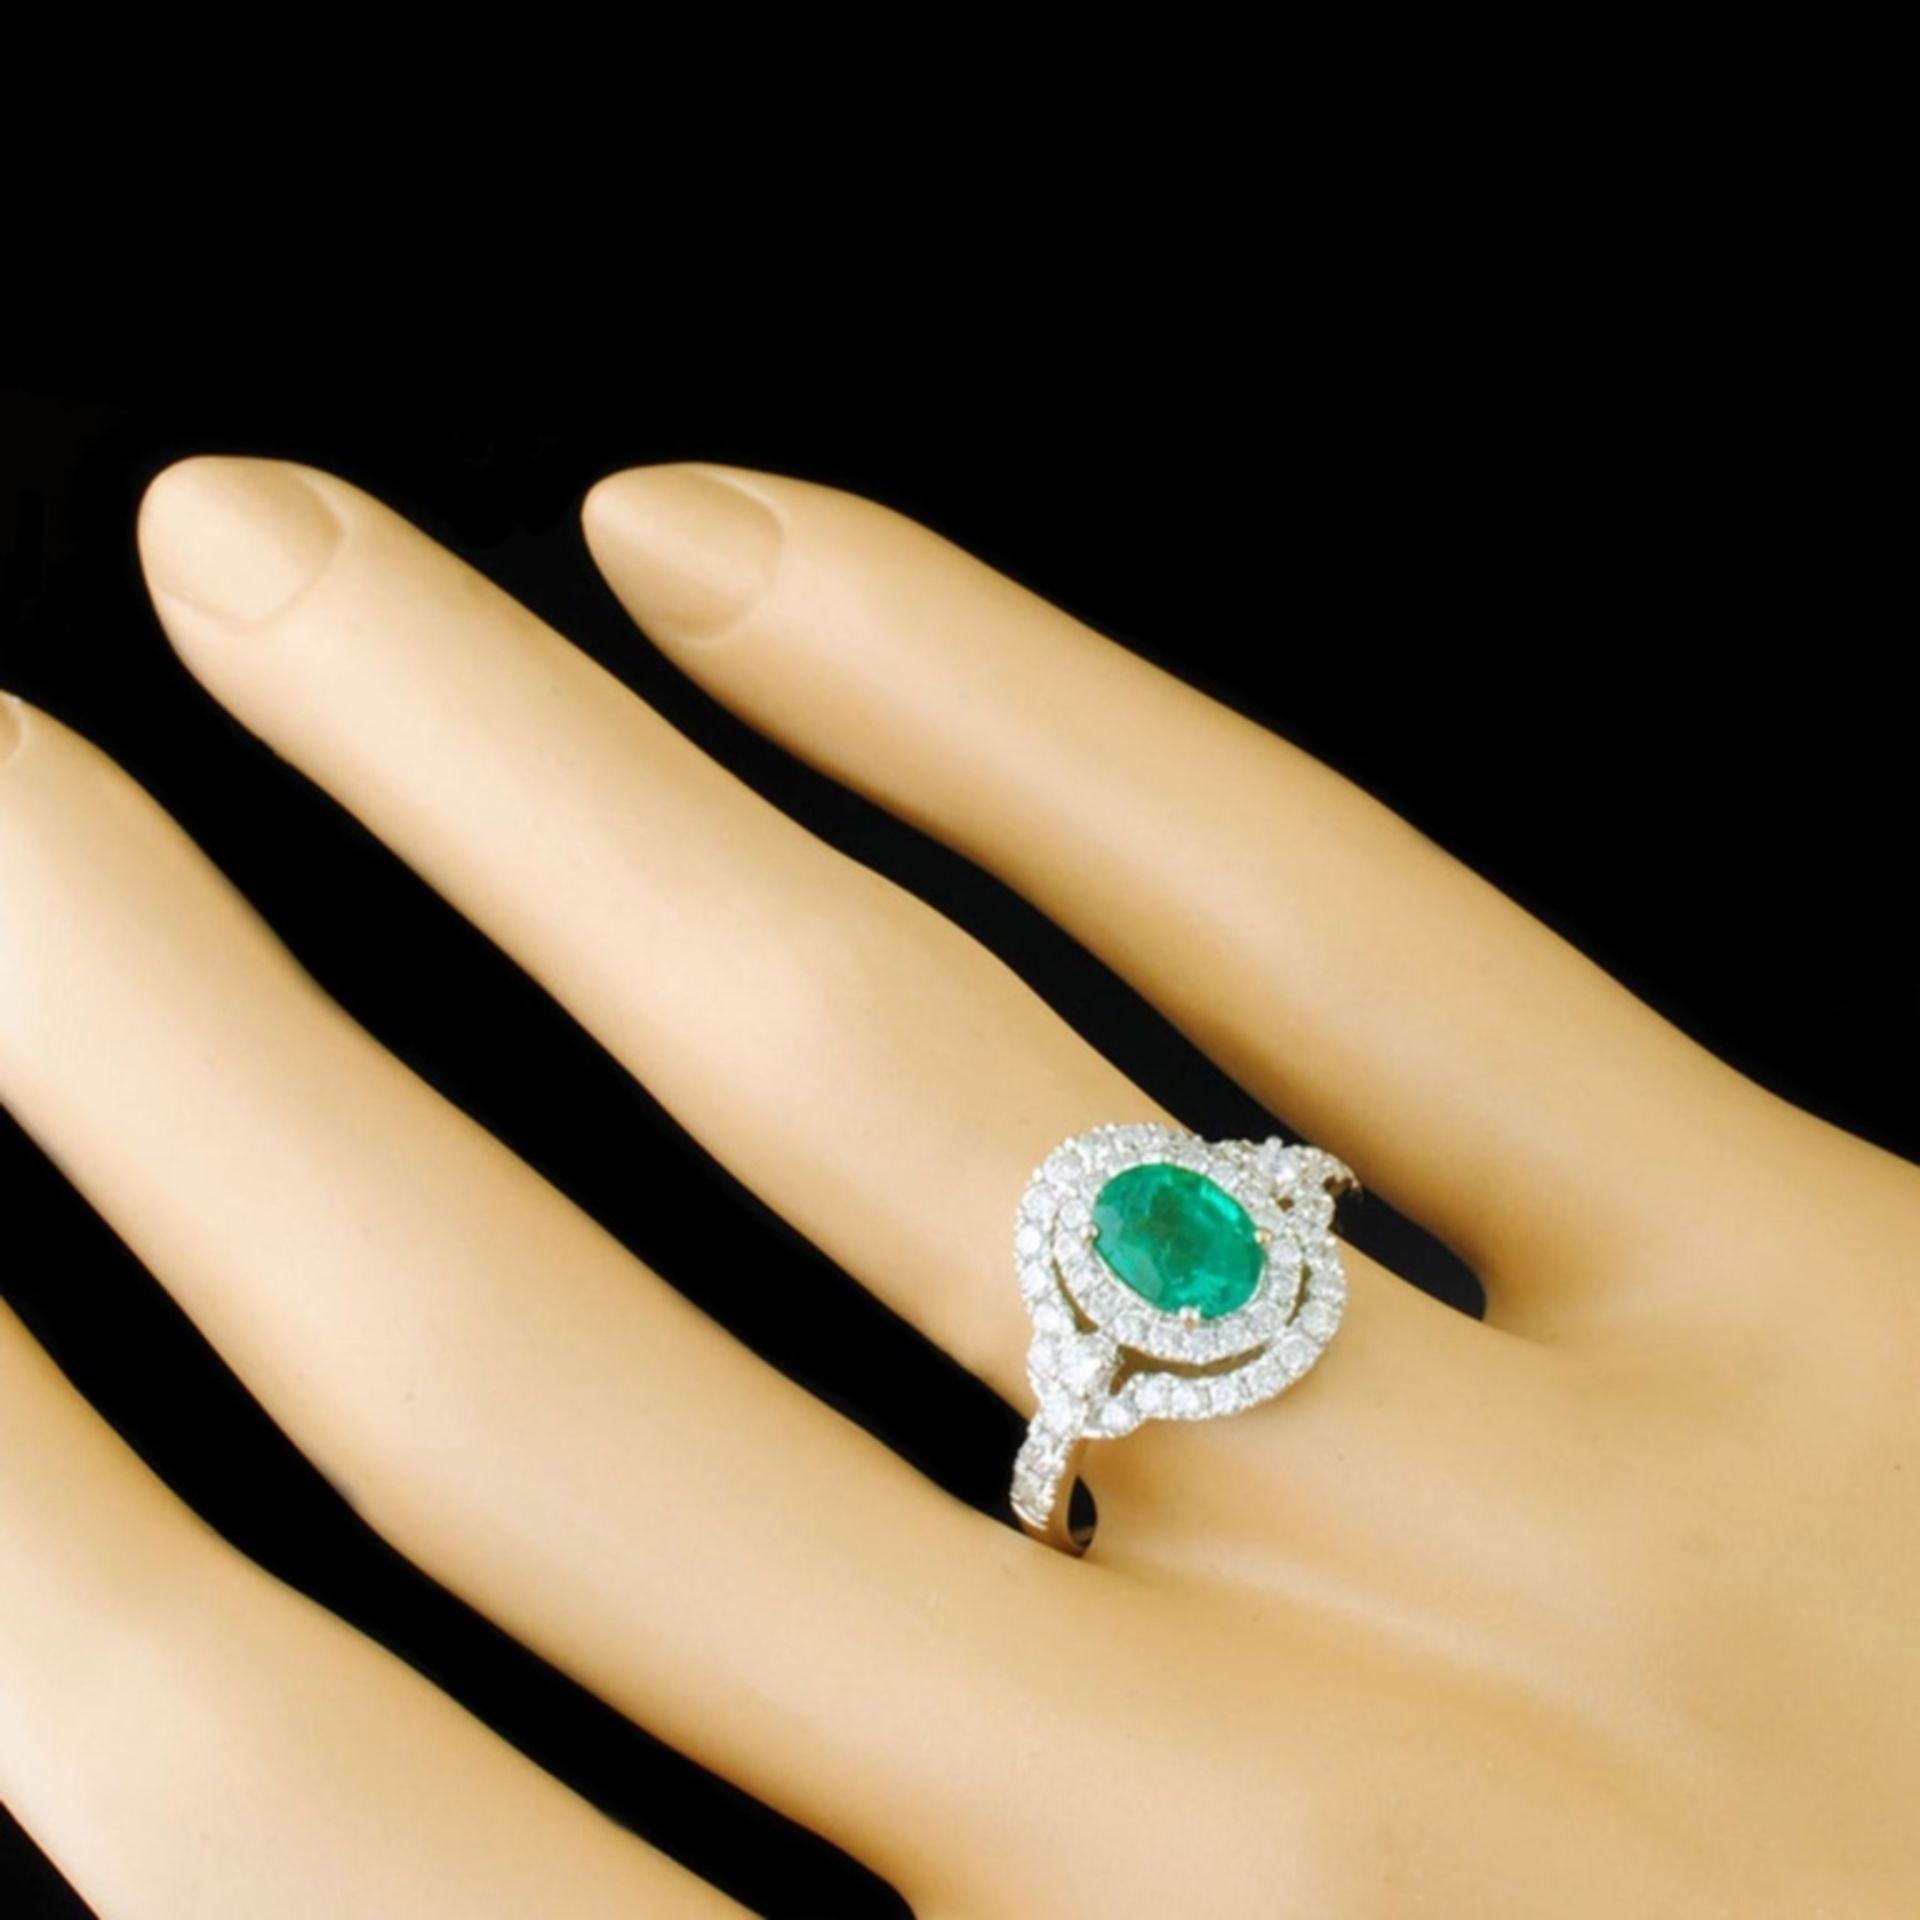 18k White Gold 0.93ct Emerald & 0.82ctw Diamond Ri - Image 3 of 4